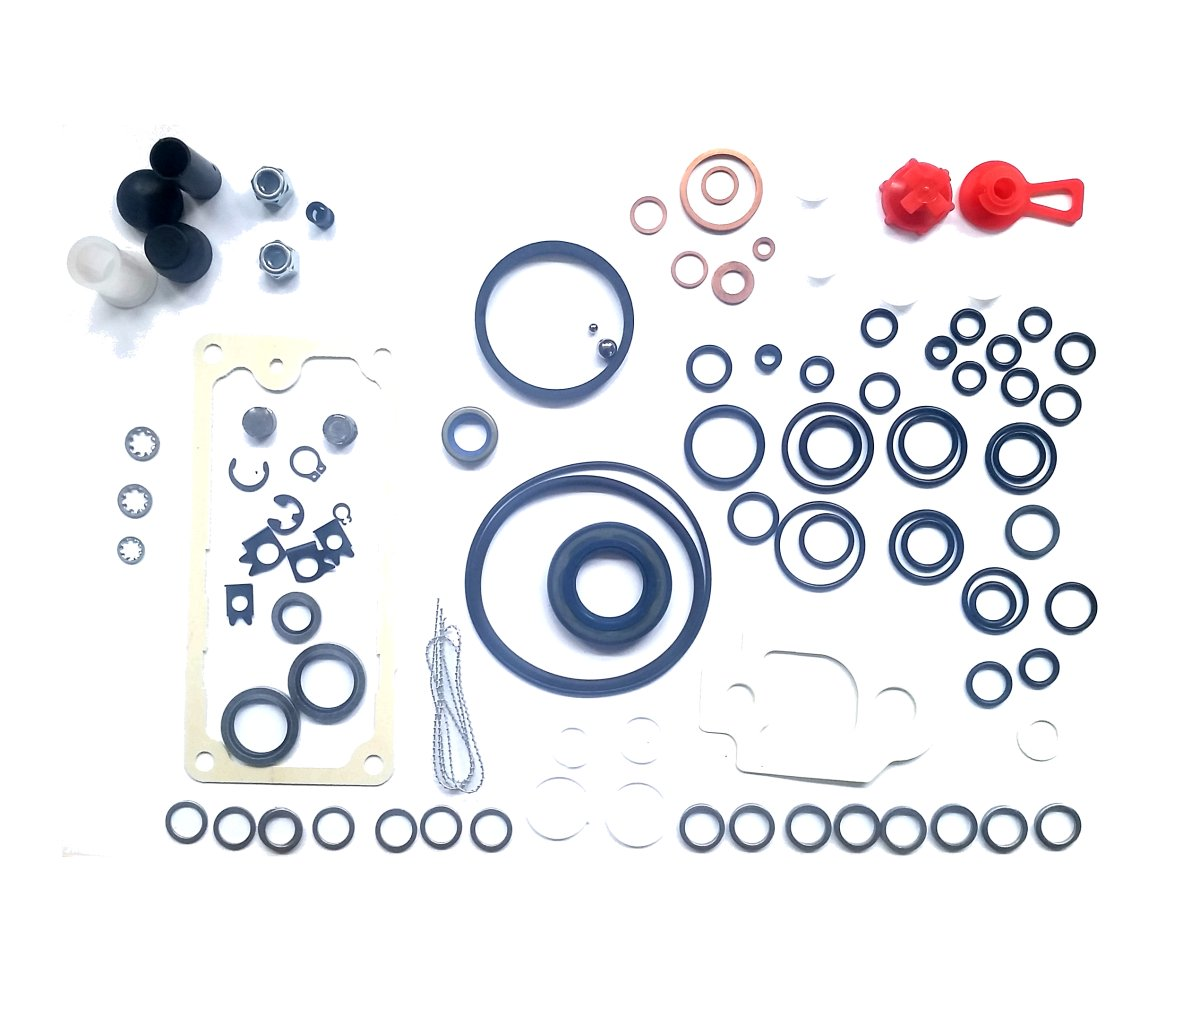 Cav Injection Pump Rebuild Kit Pin Lucas Diagram On Pinterest Complete Seal Repair For Delphi Cummins 1200x1017